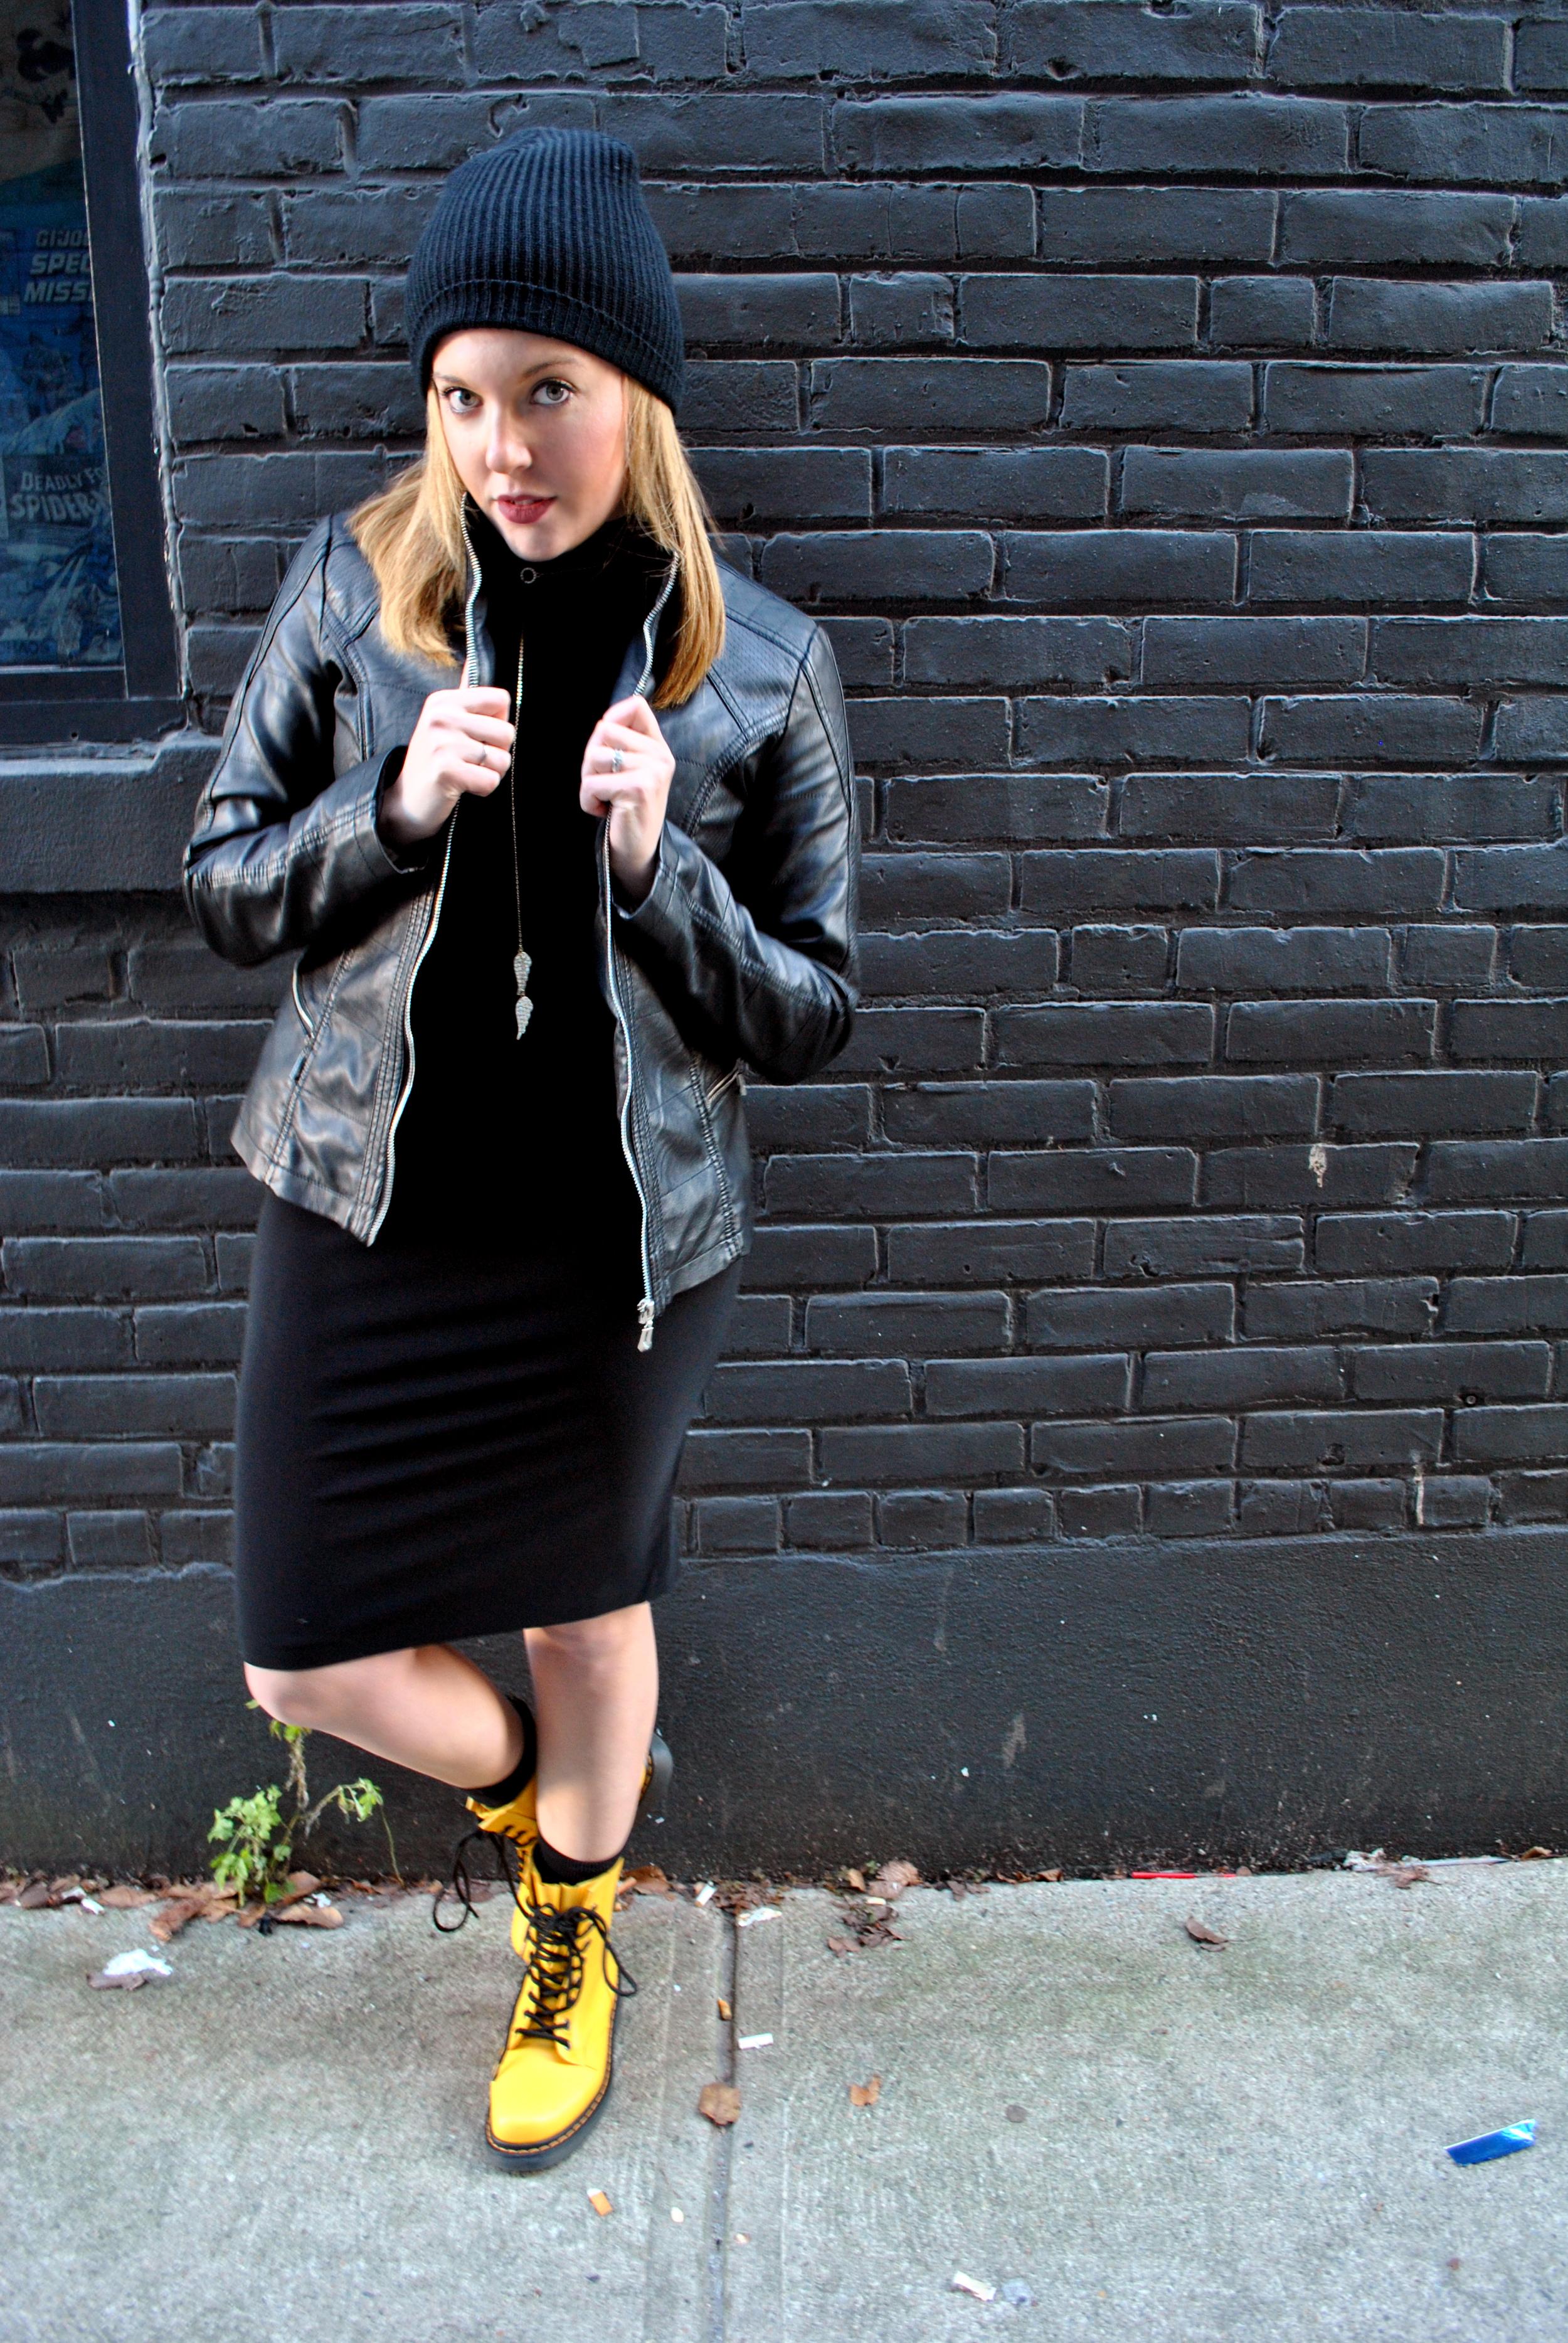 Black turtleneck dress and beanie - Thoughtfulwish